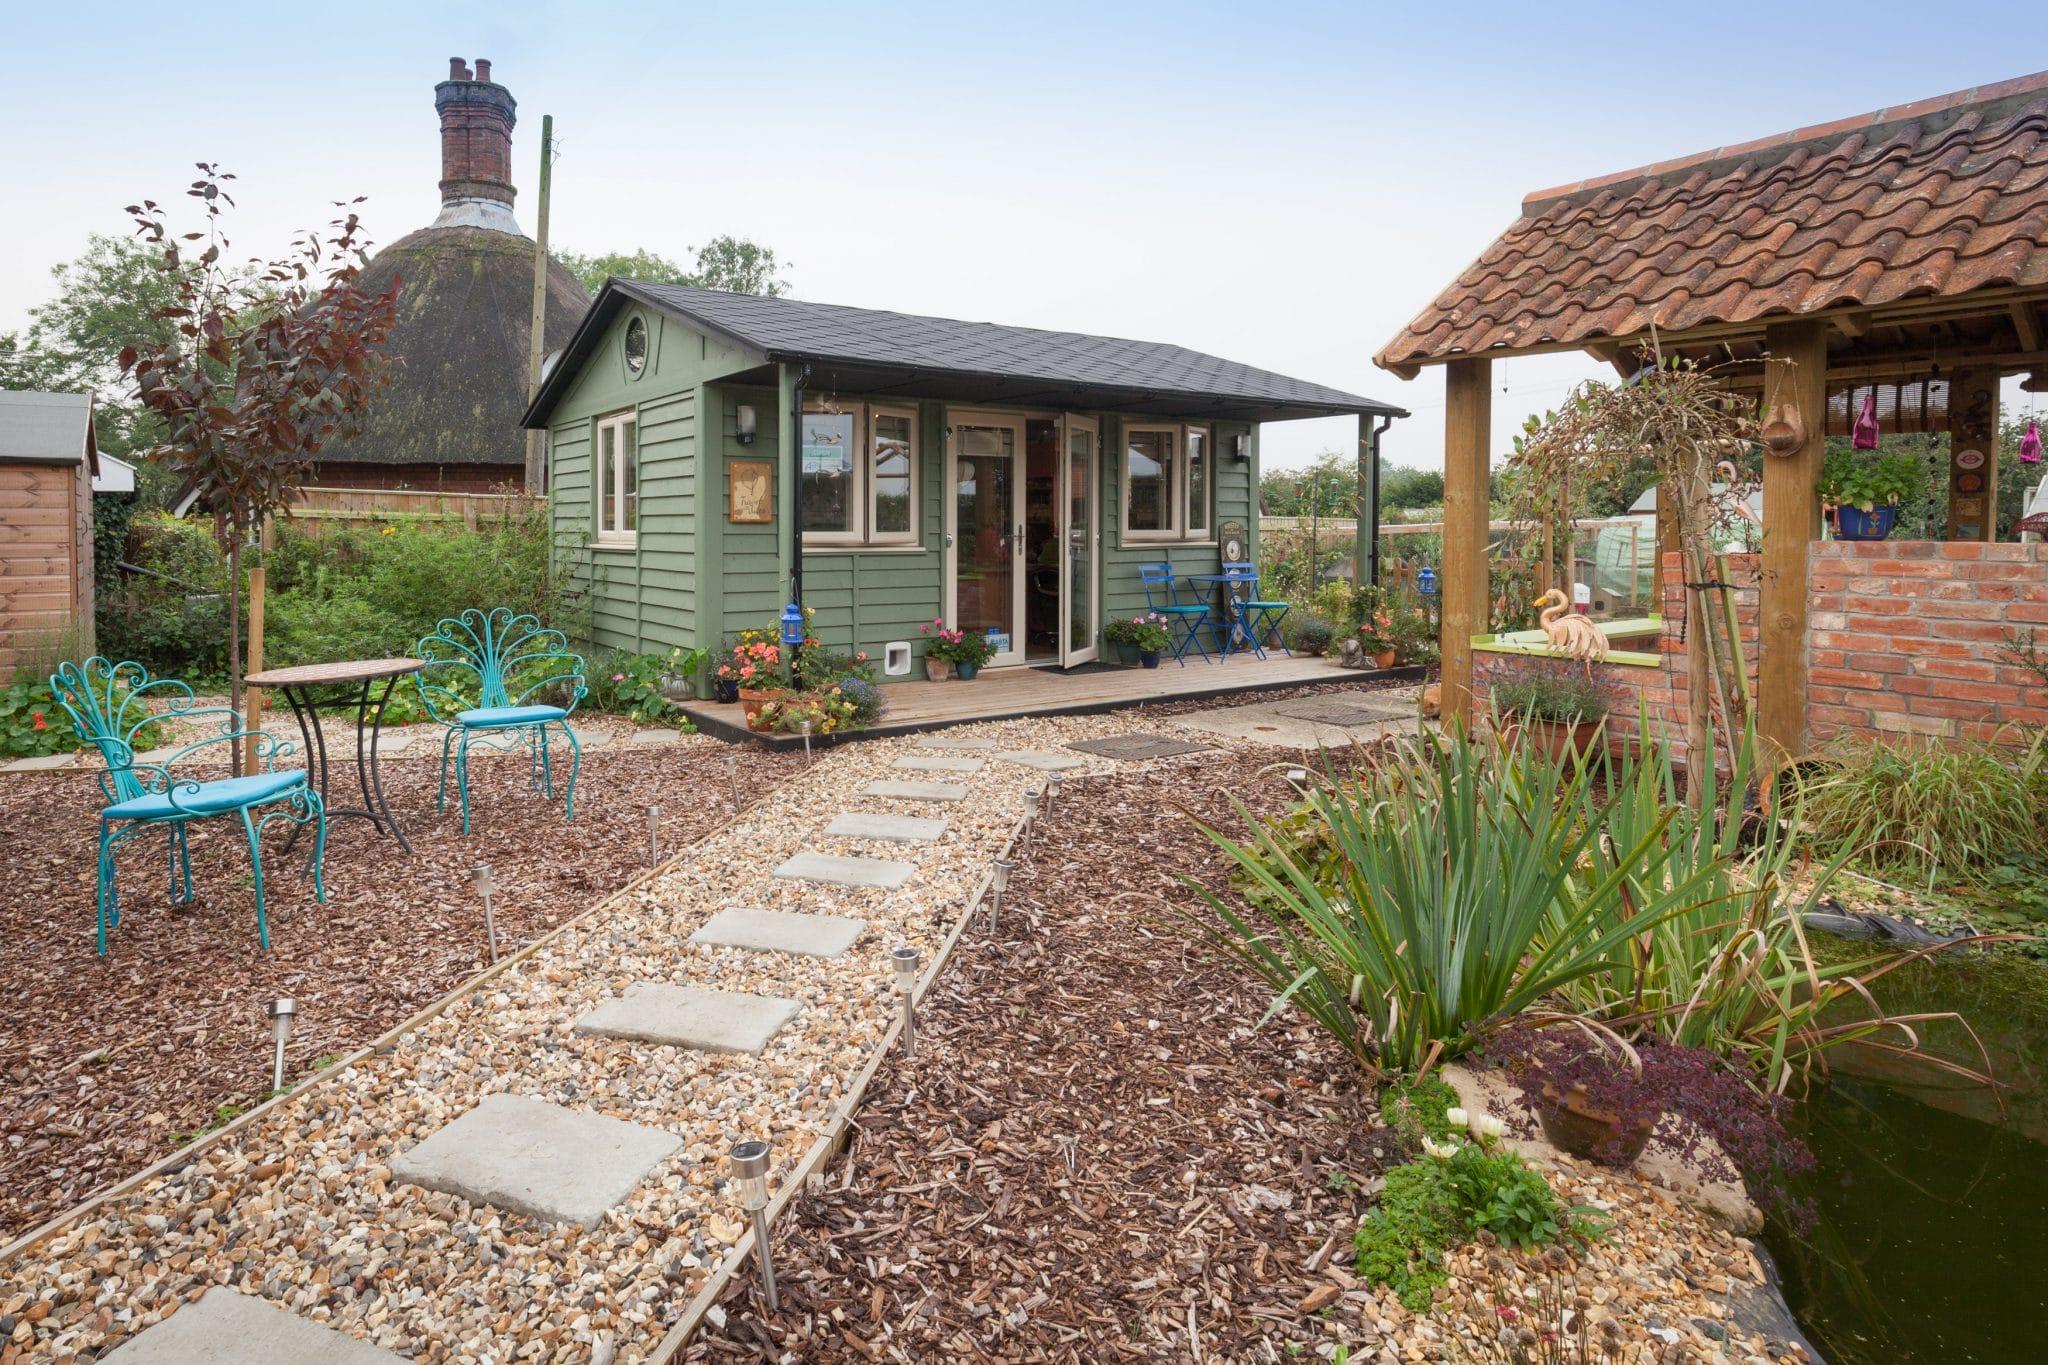 Smart Garden Office - Suffolk Barn Quinto